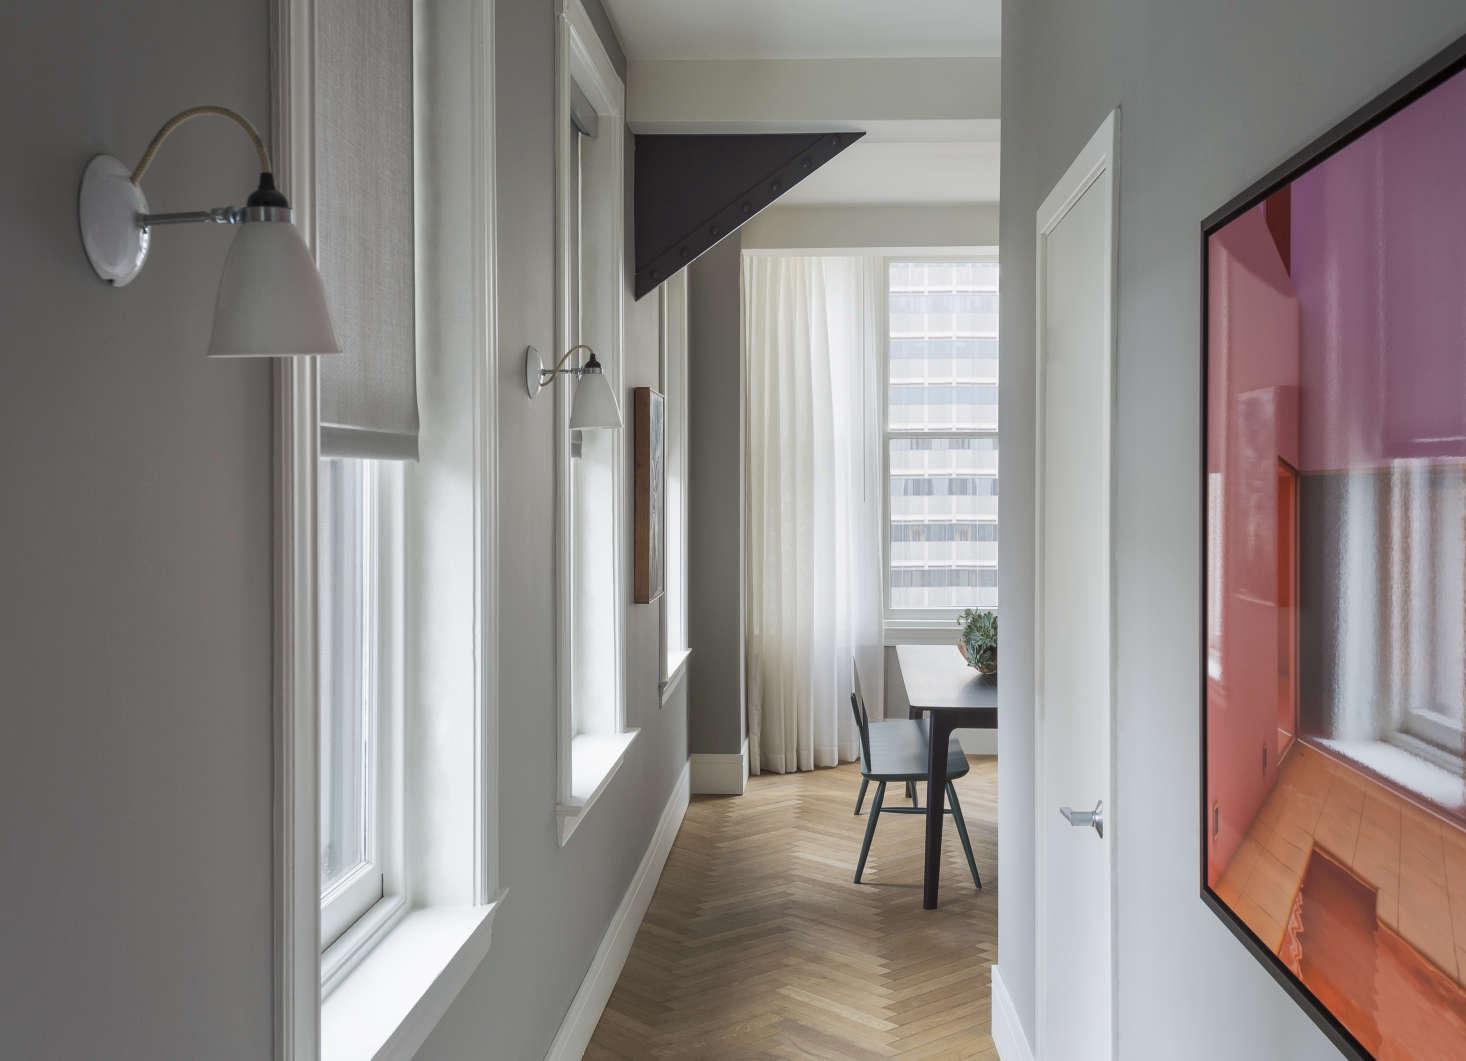 Roost-Rittenhouse-Philadelphia-Morris-Adjmi-Architects-Roost-photo-Remodelista-9